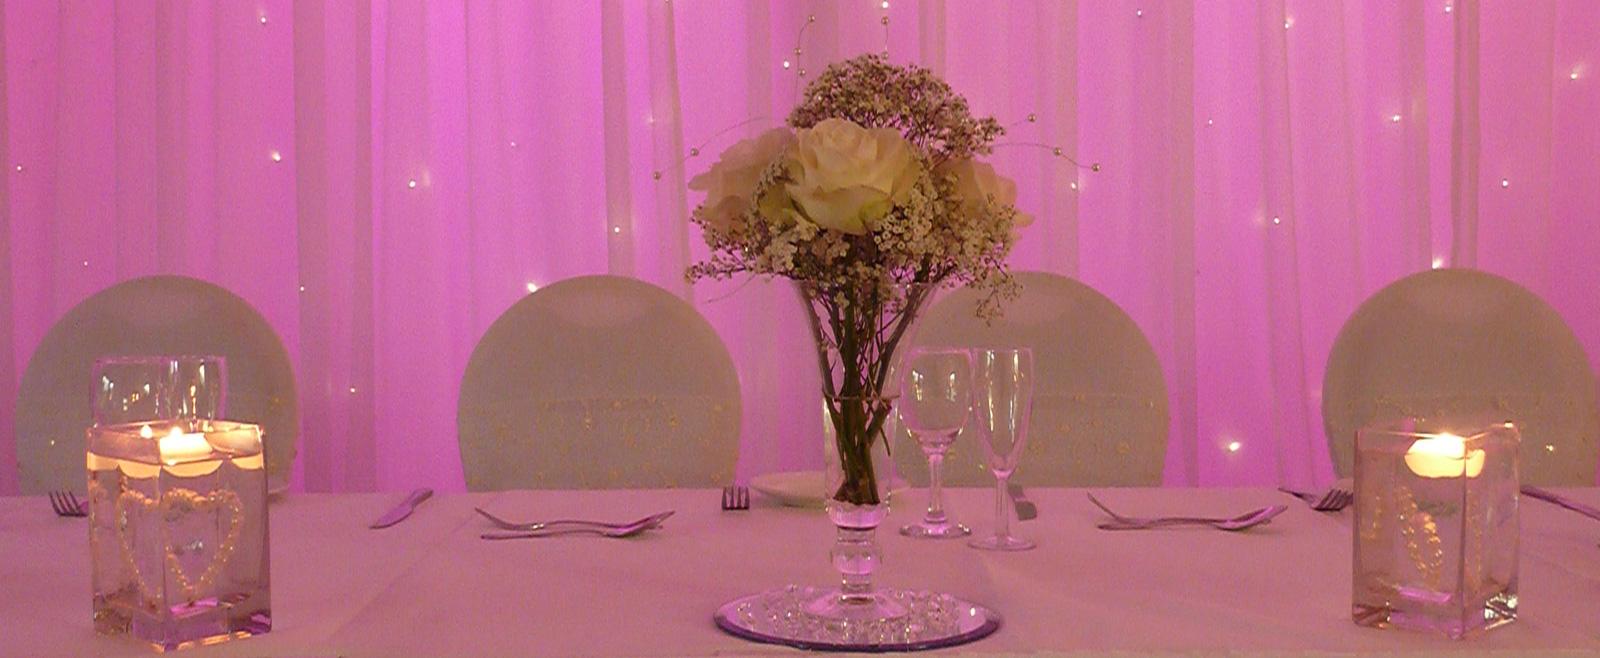 Wedding Venue Styling - Creative Lighting